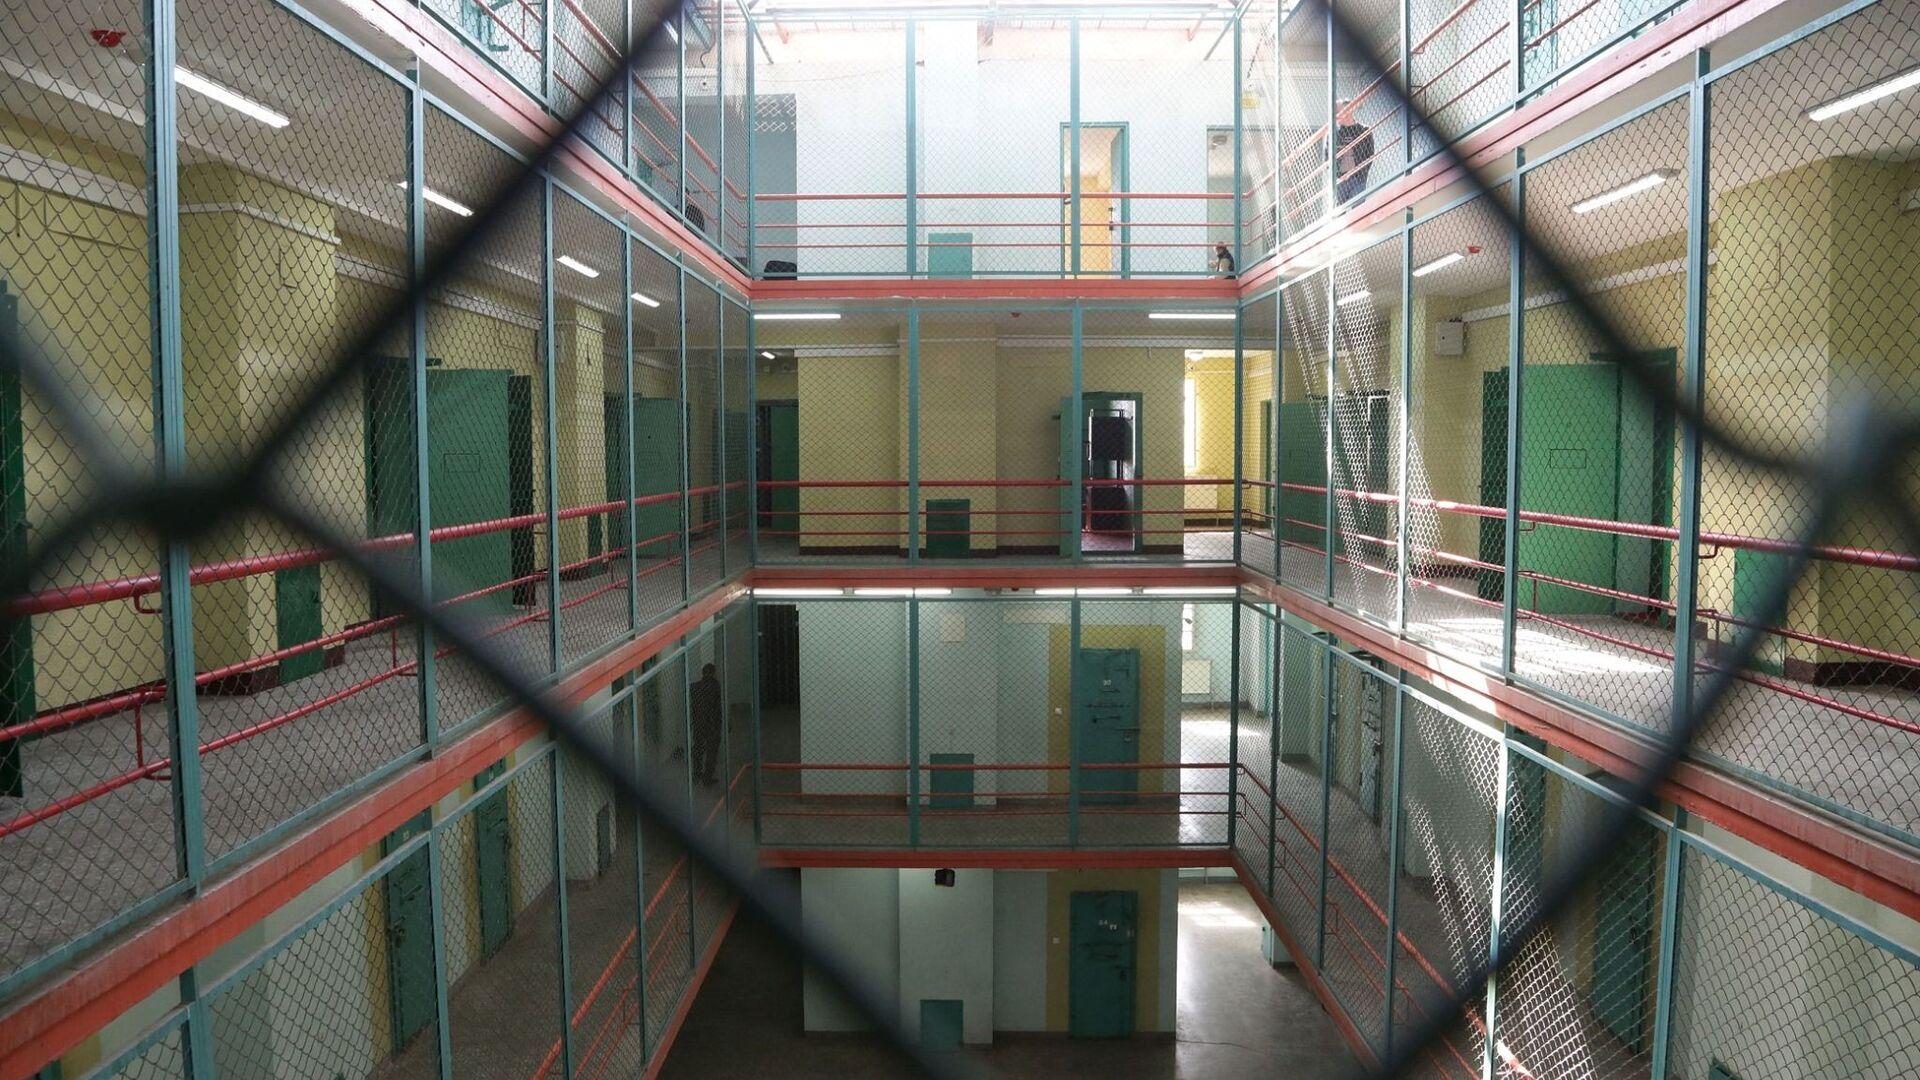 Тюрьма - Sputnik Грузия, 1920, 21.09.2021